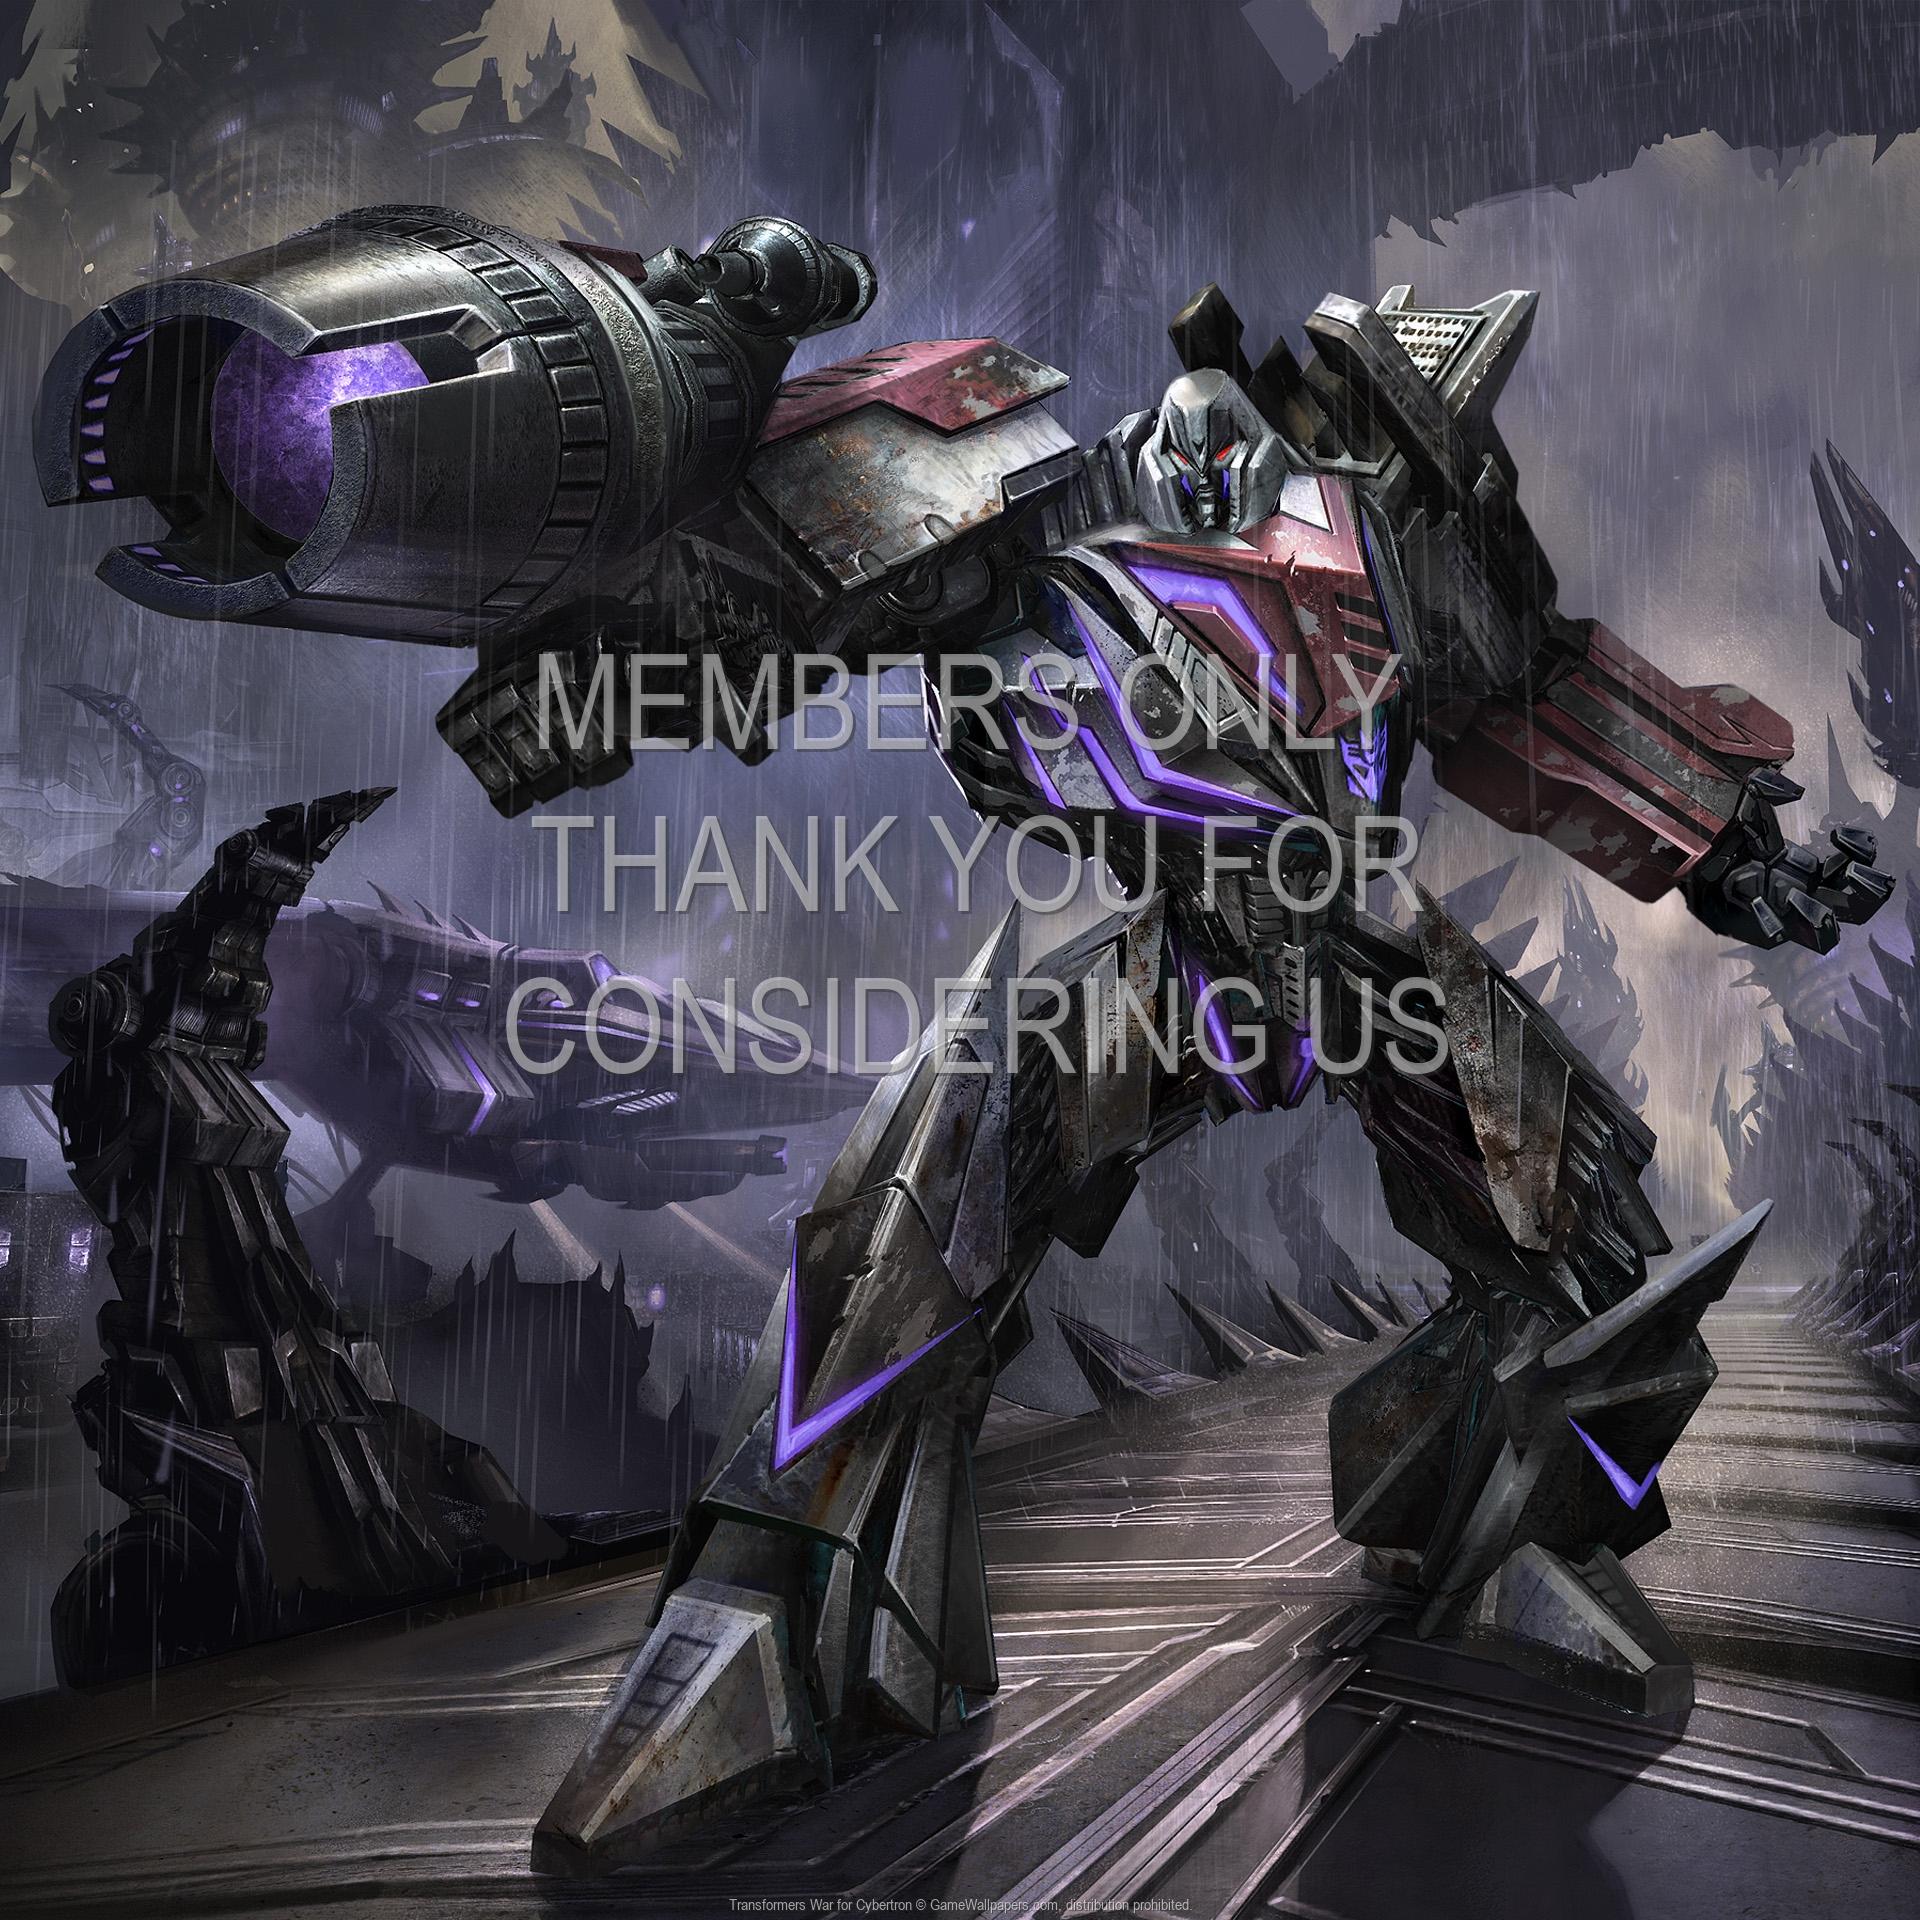 Transformers War For Cybertron Wallpaper 03 1920x1080